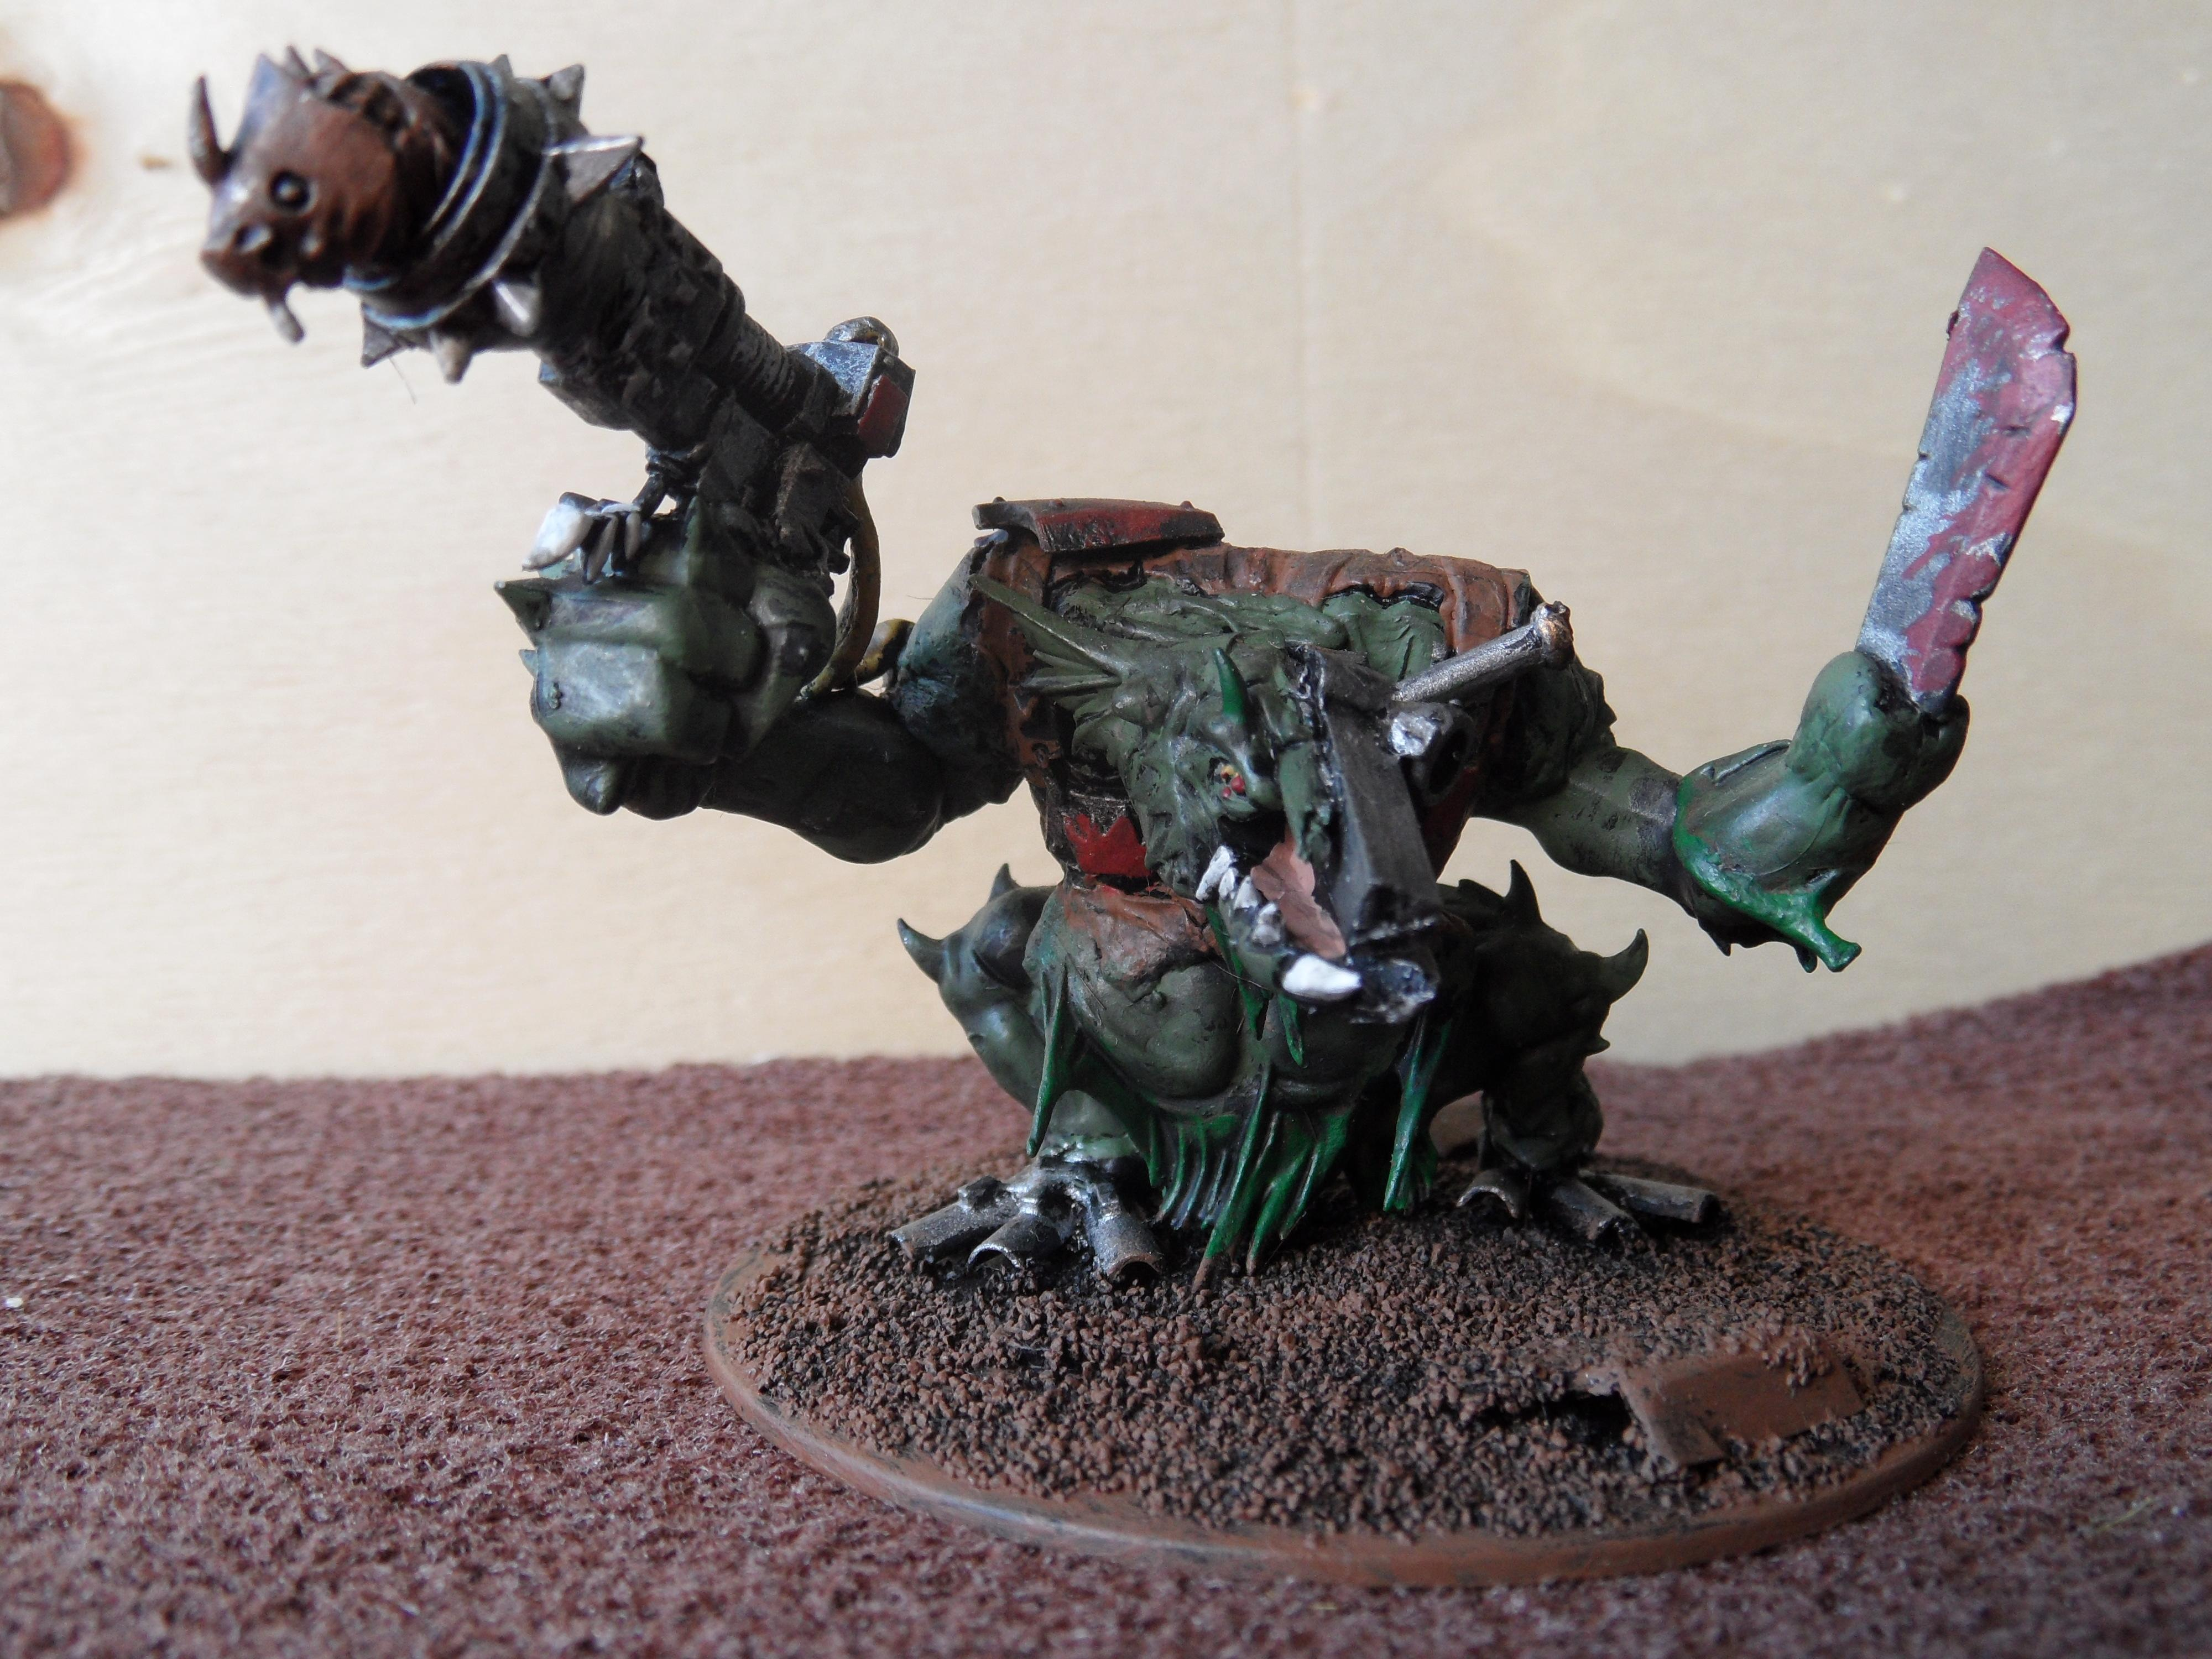 Bloodbasher, Bludbasher, Bludbasherz, Conversion, Orks, River Troll